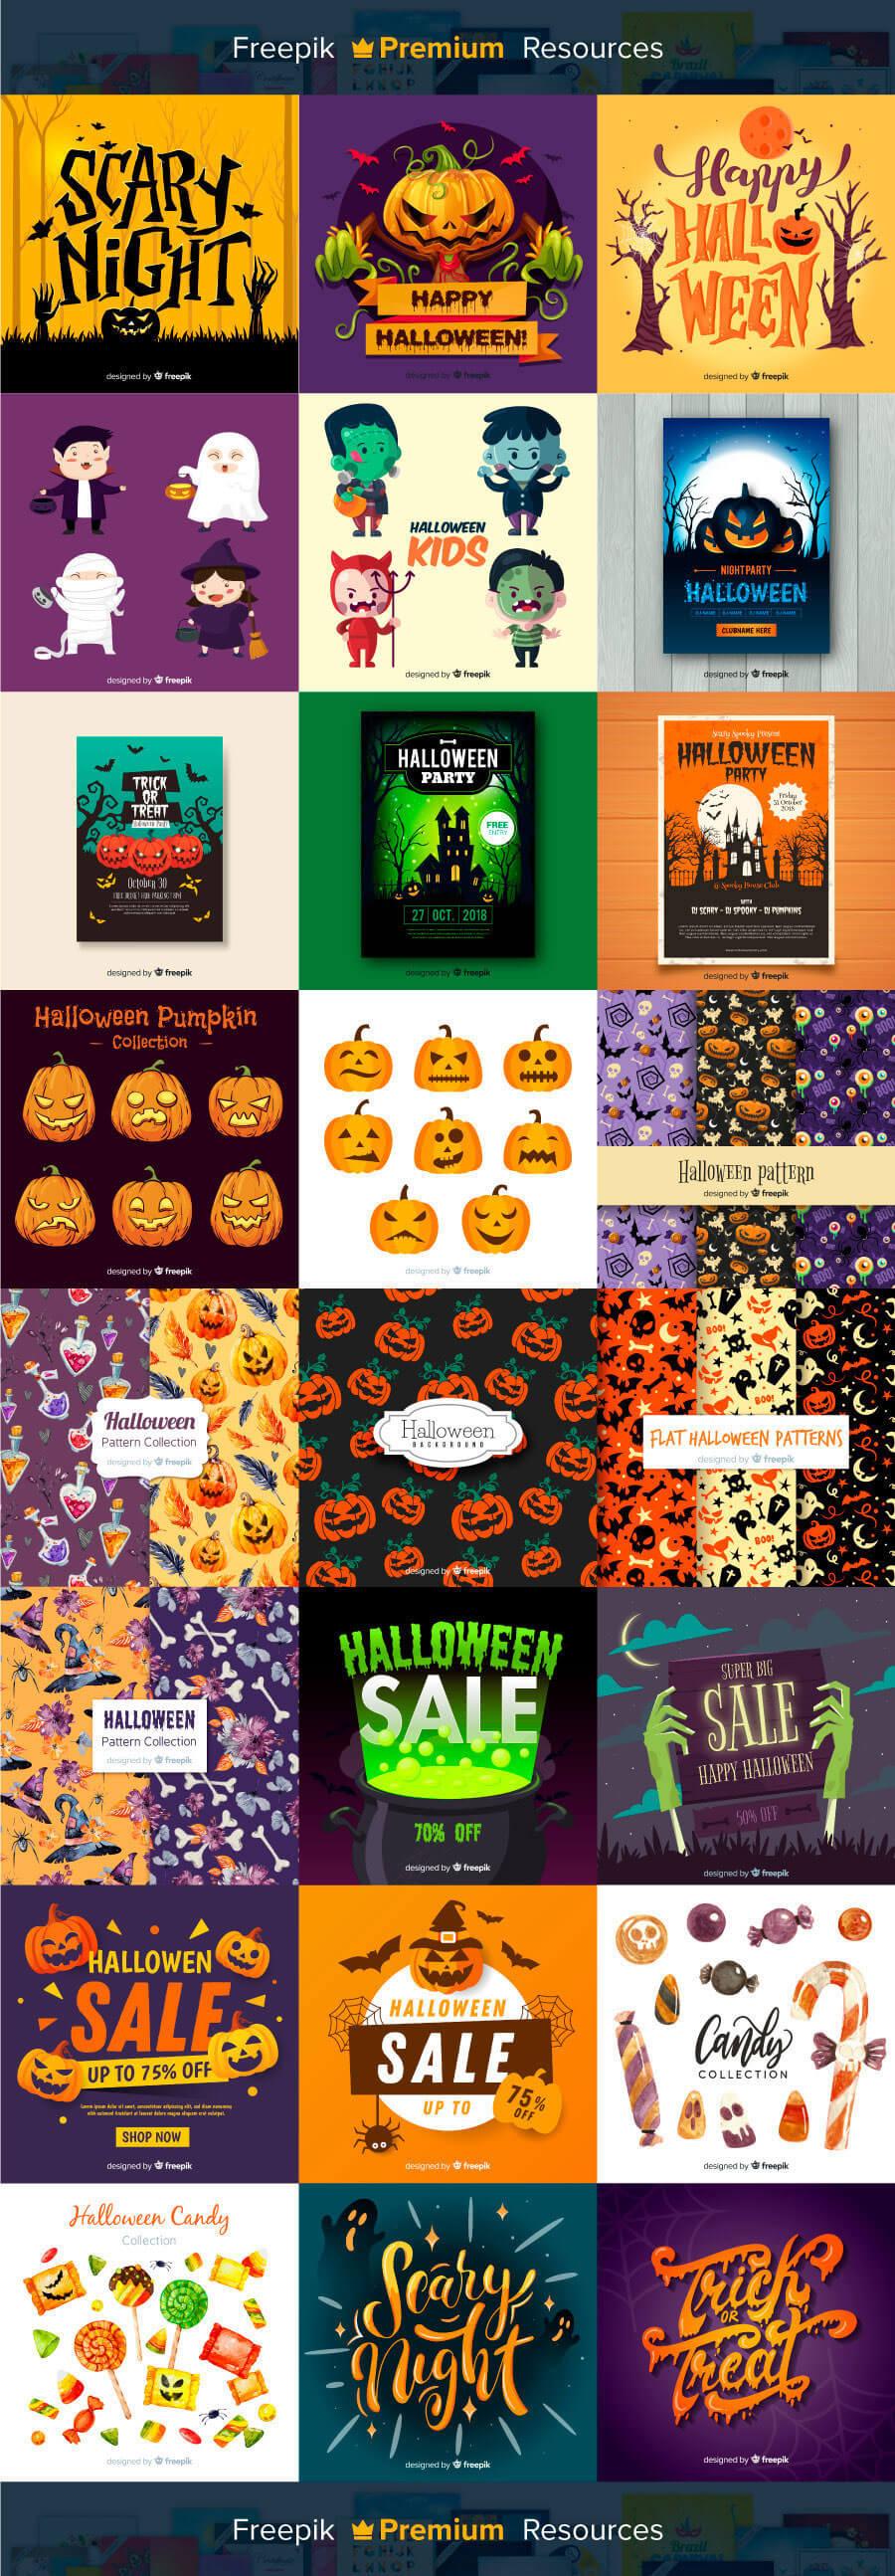 fp_halloween_countdown_2